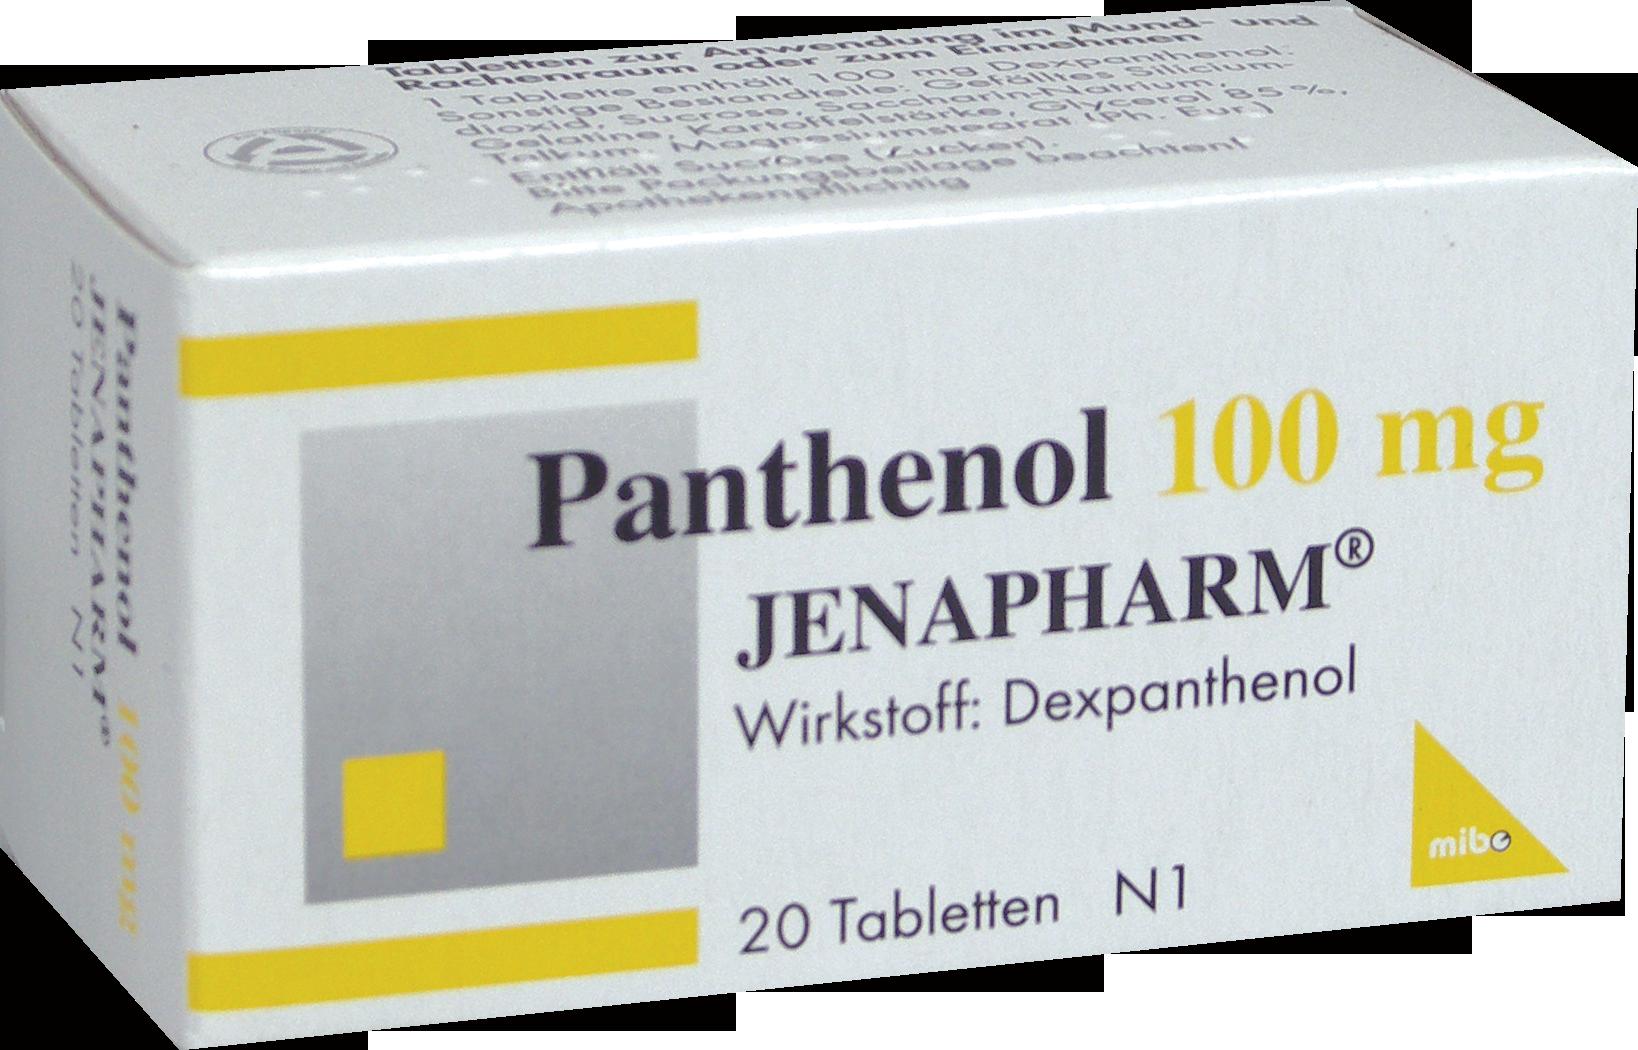 PANTHENOL 100MG Jenapharm